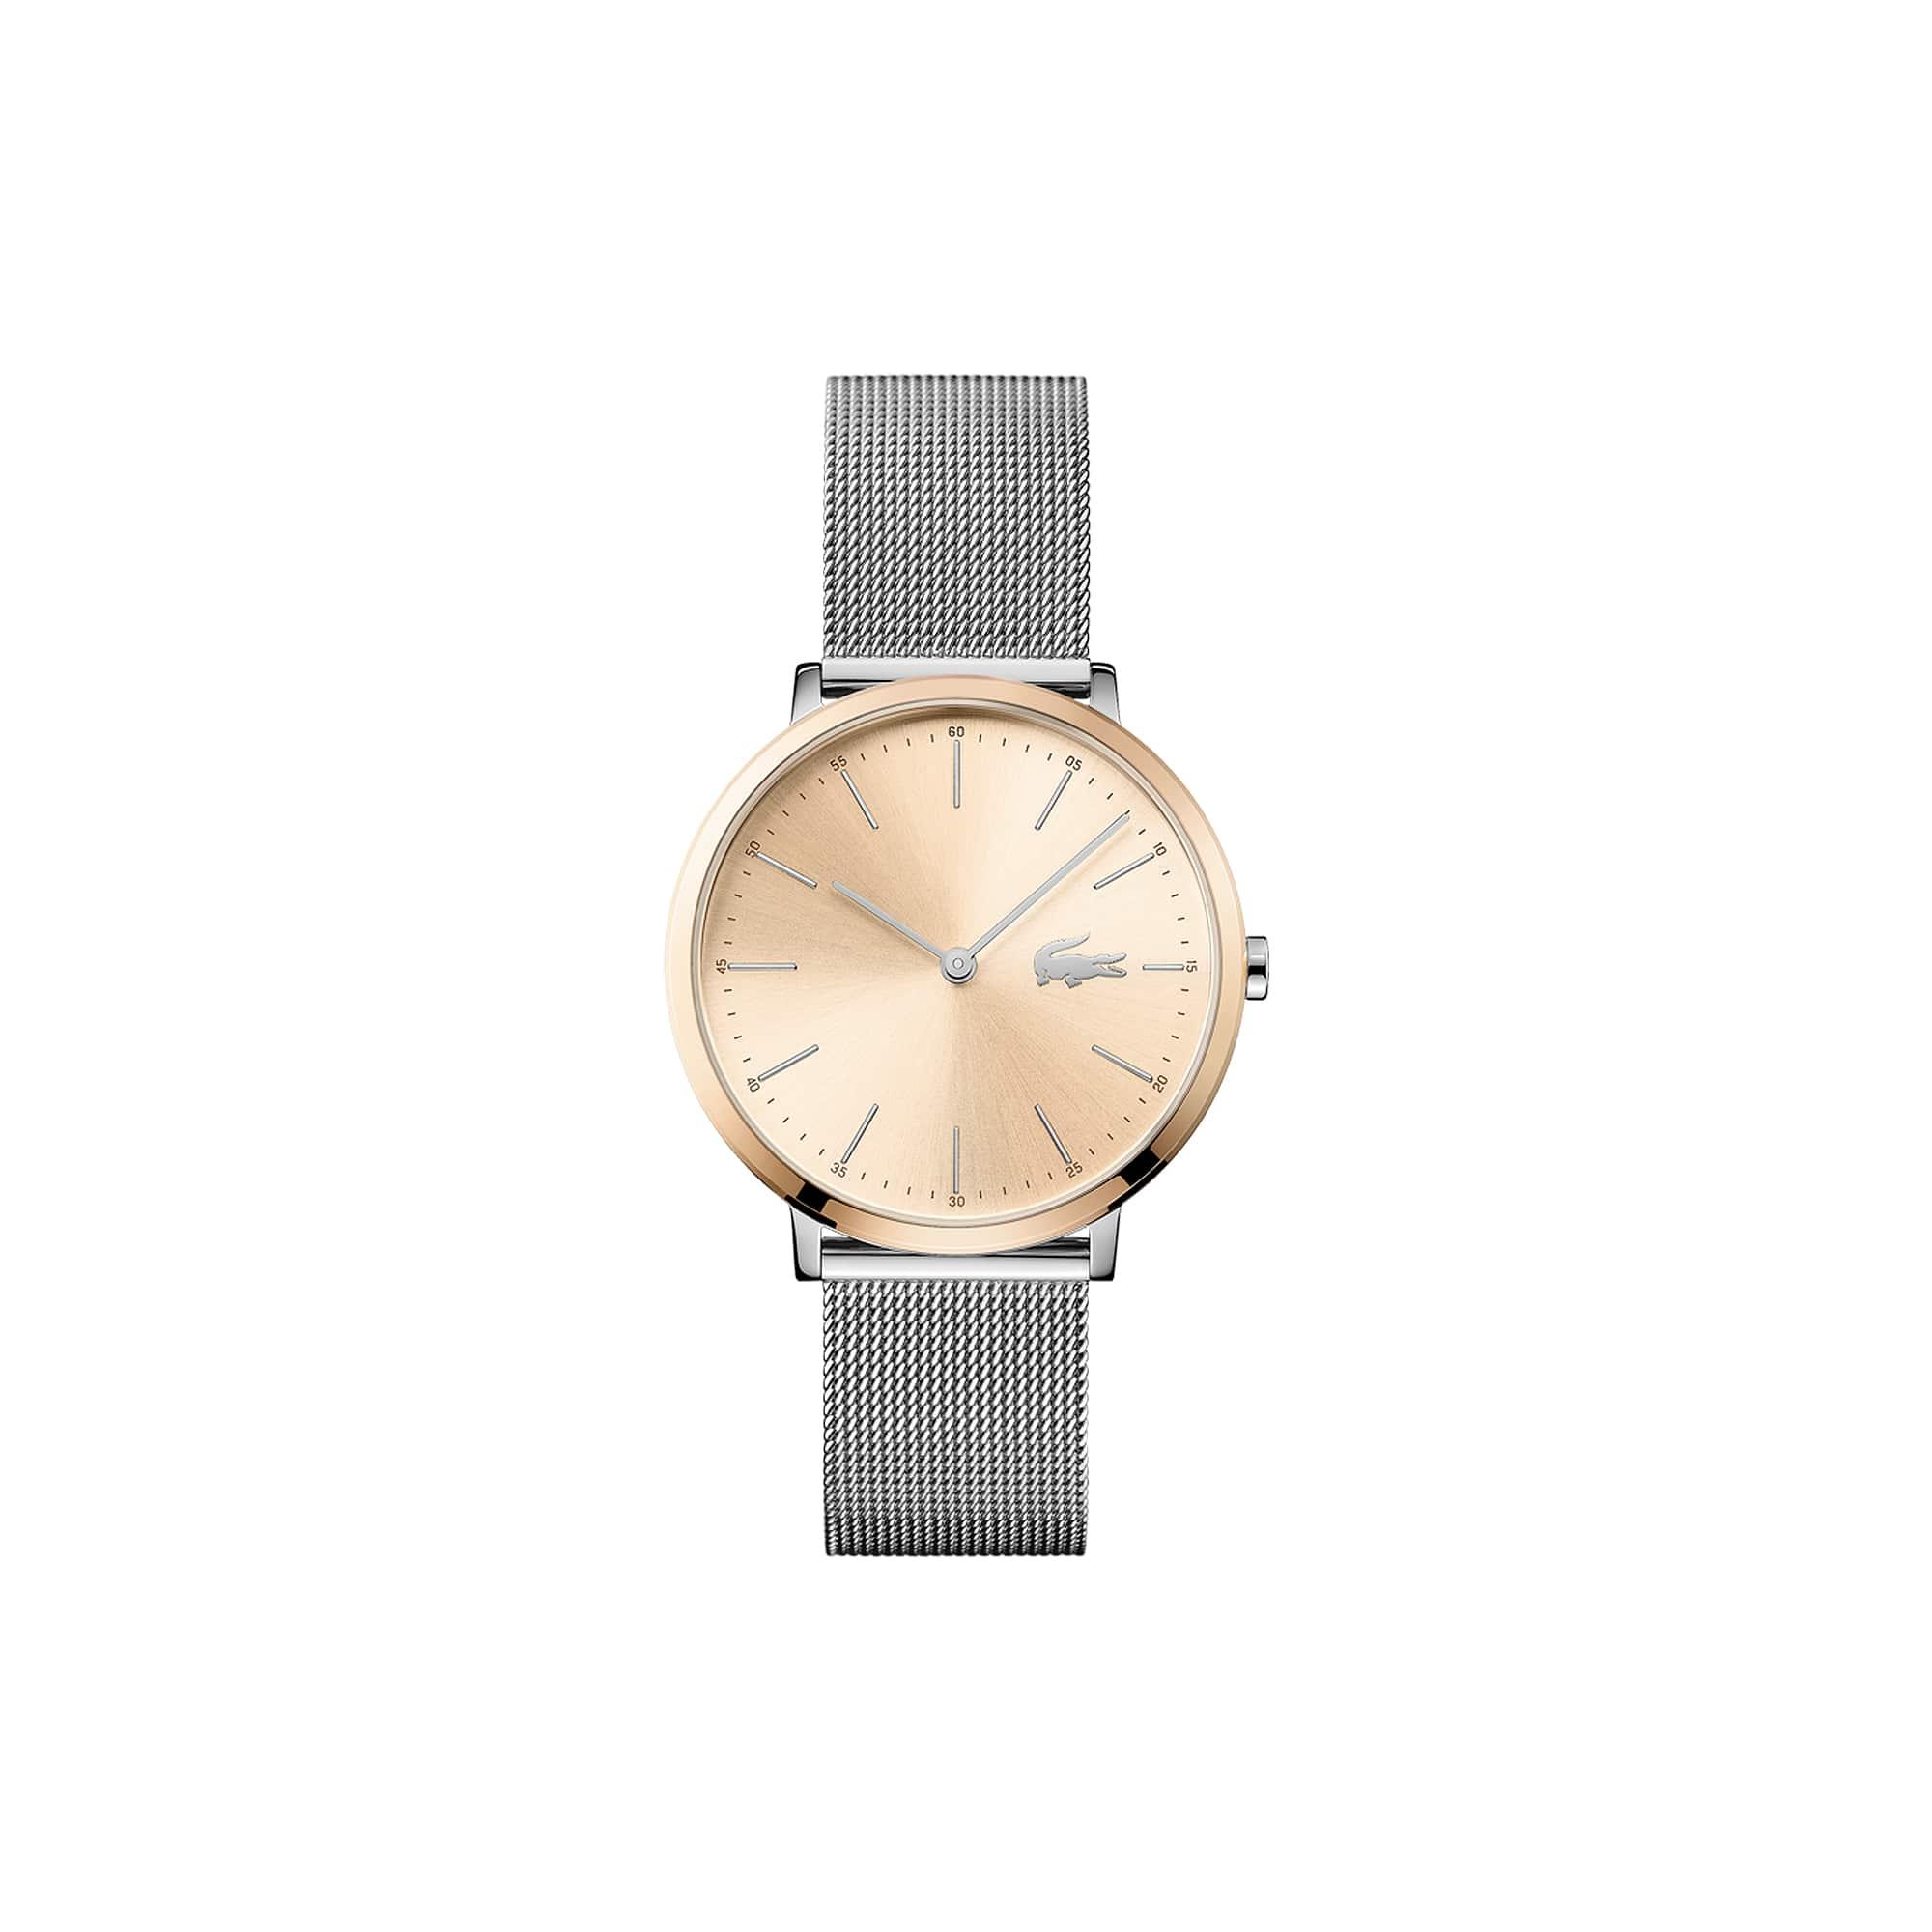 Reloj de Mujer Moon Ultrafino con Pulsera de Malla de Acero Inoxidable